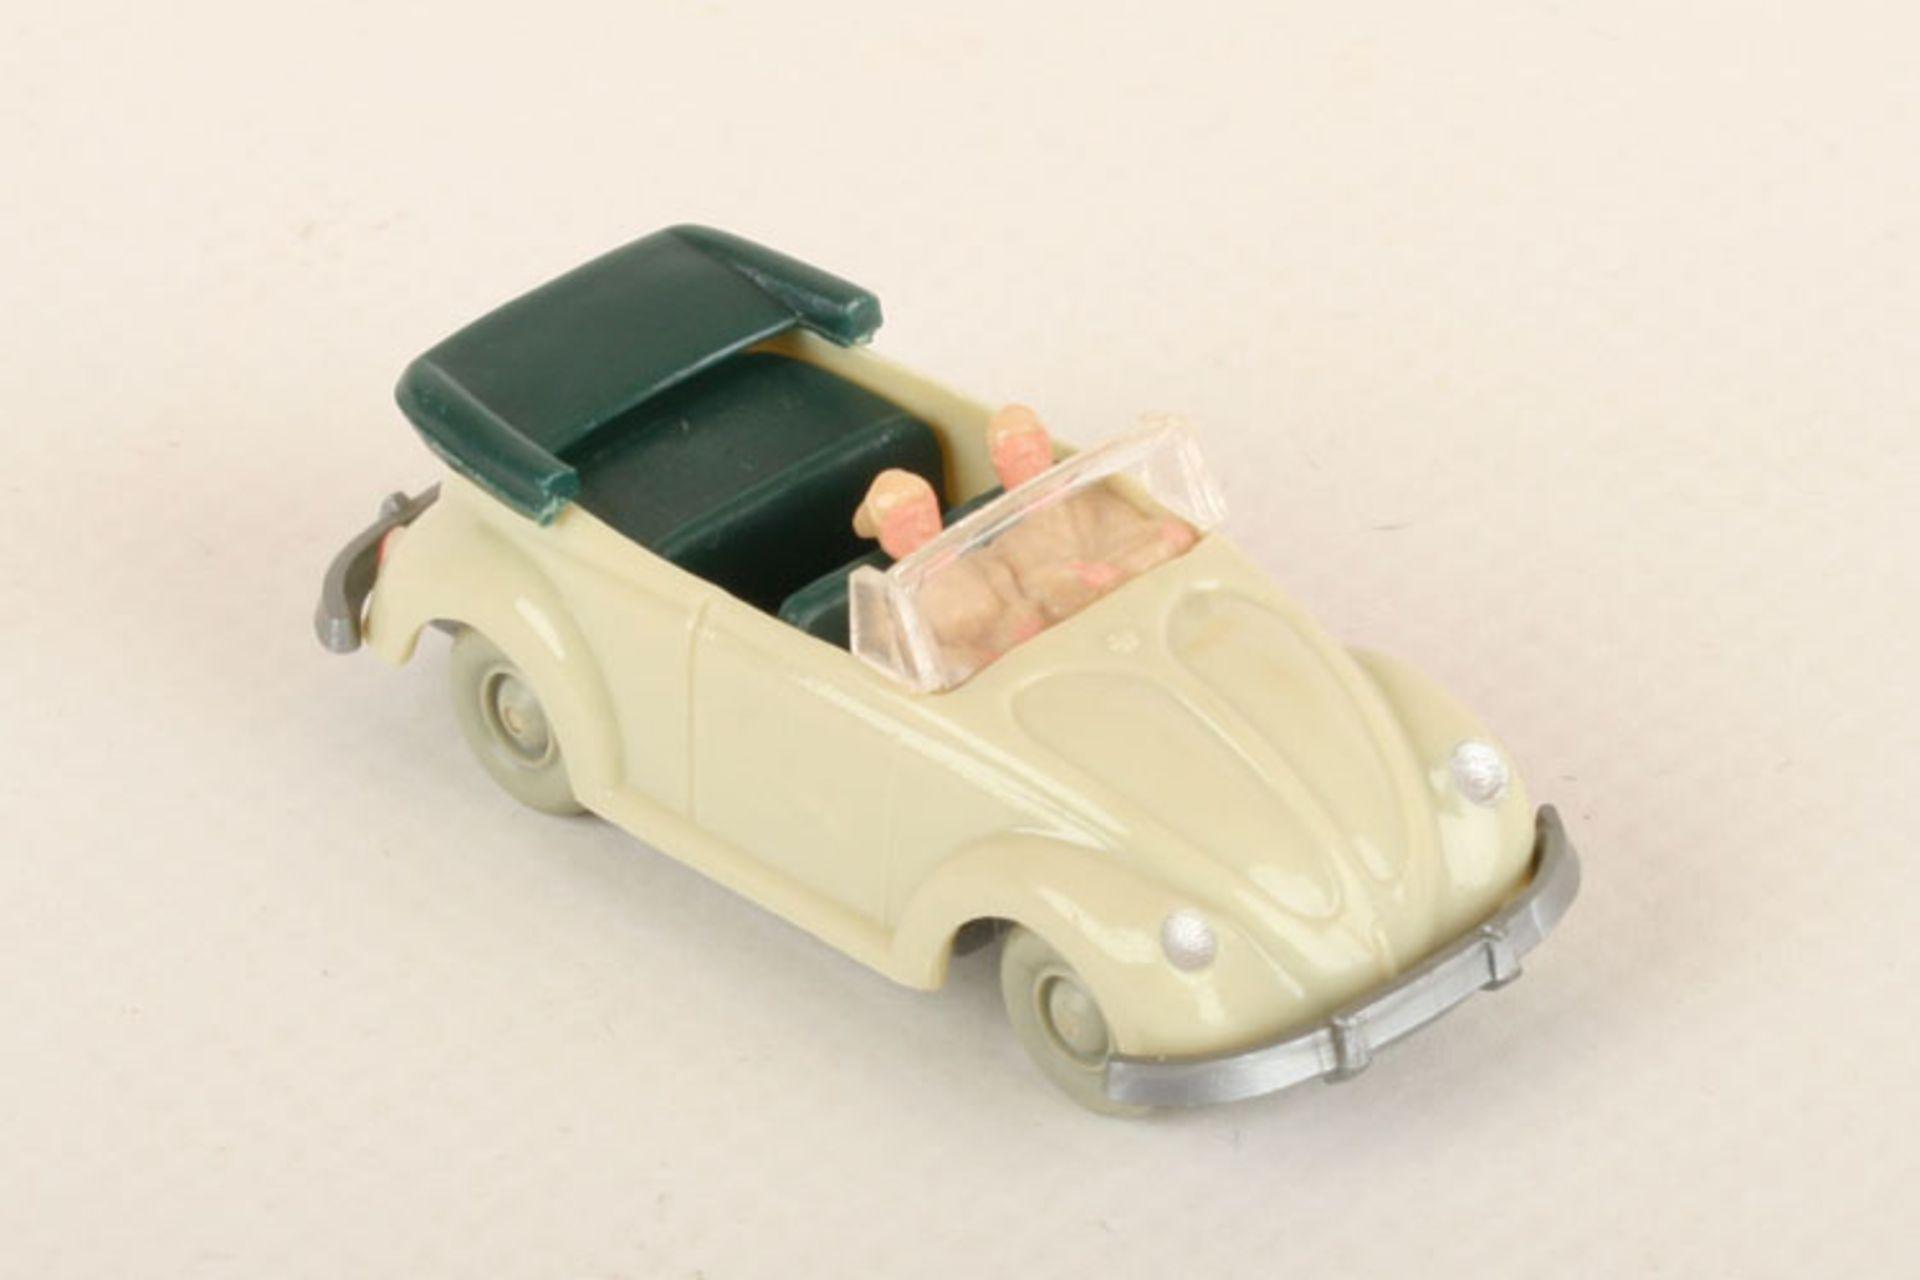 Los 1024 - Wiking VW Käfer Cabrio grünlichbeige 33/3o, IE blaugrün, neuwertig